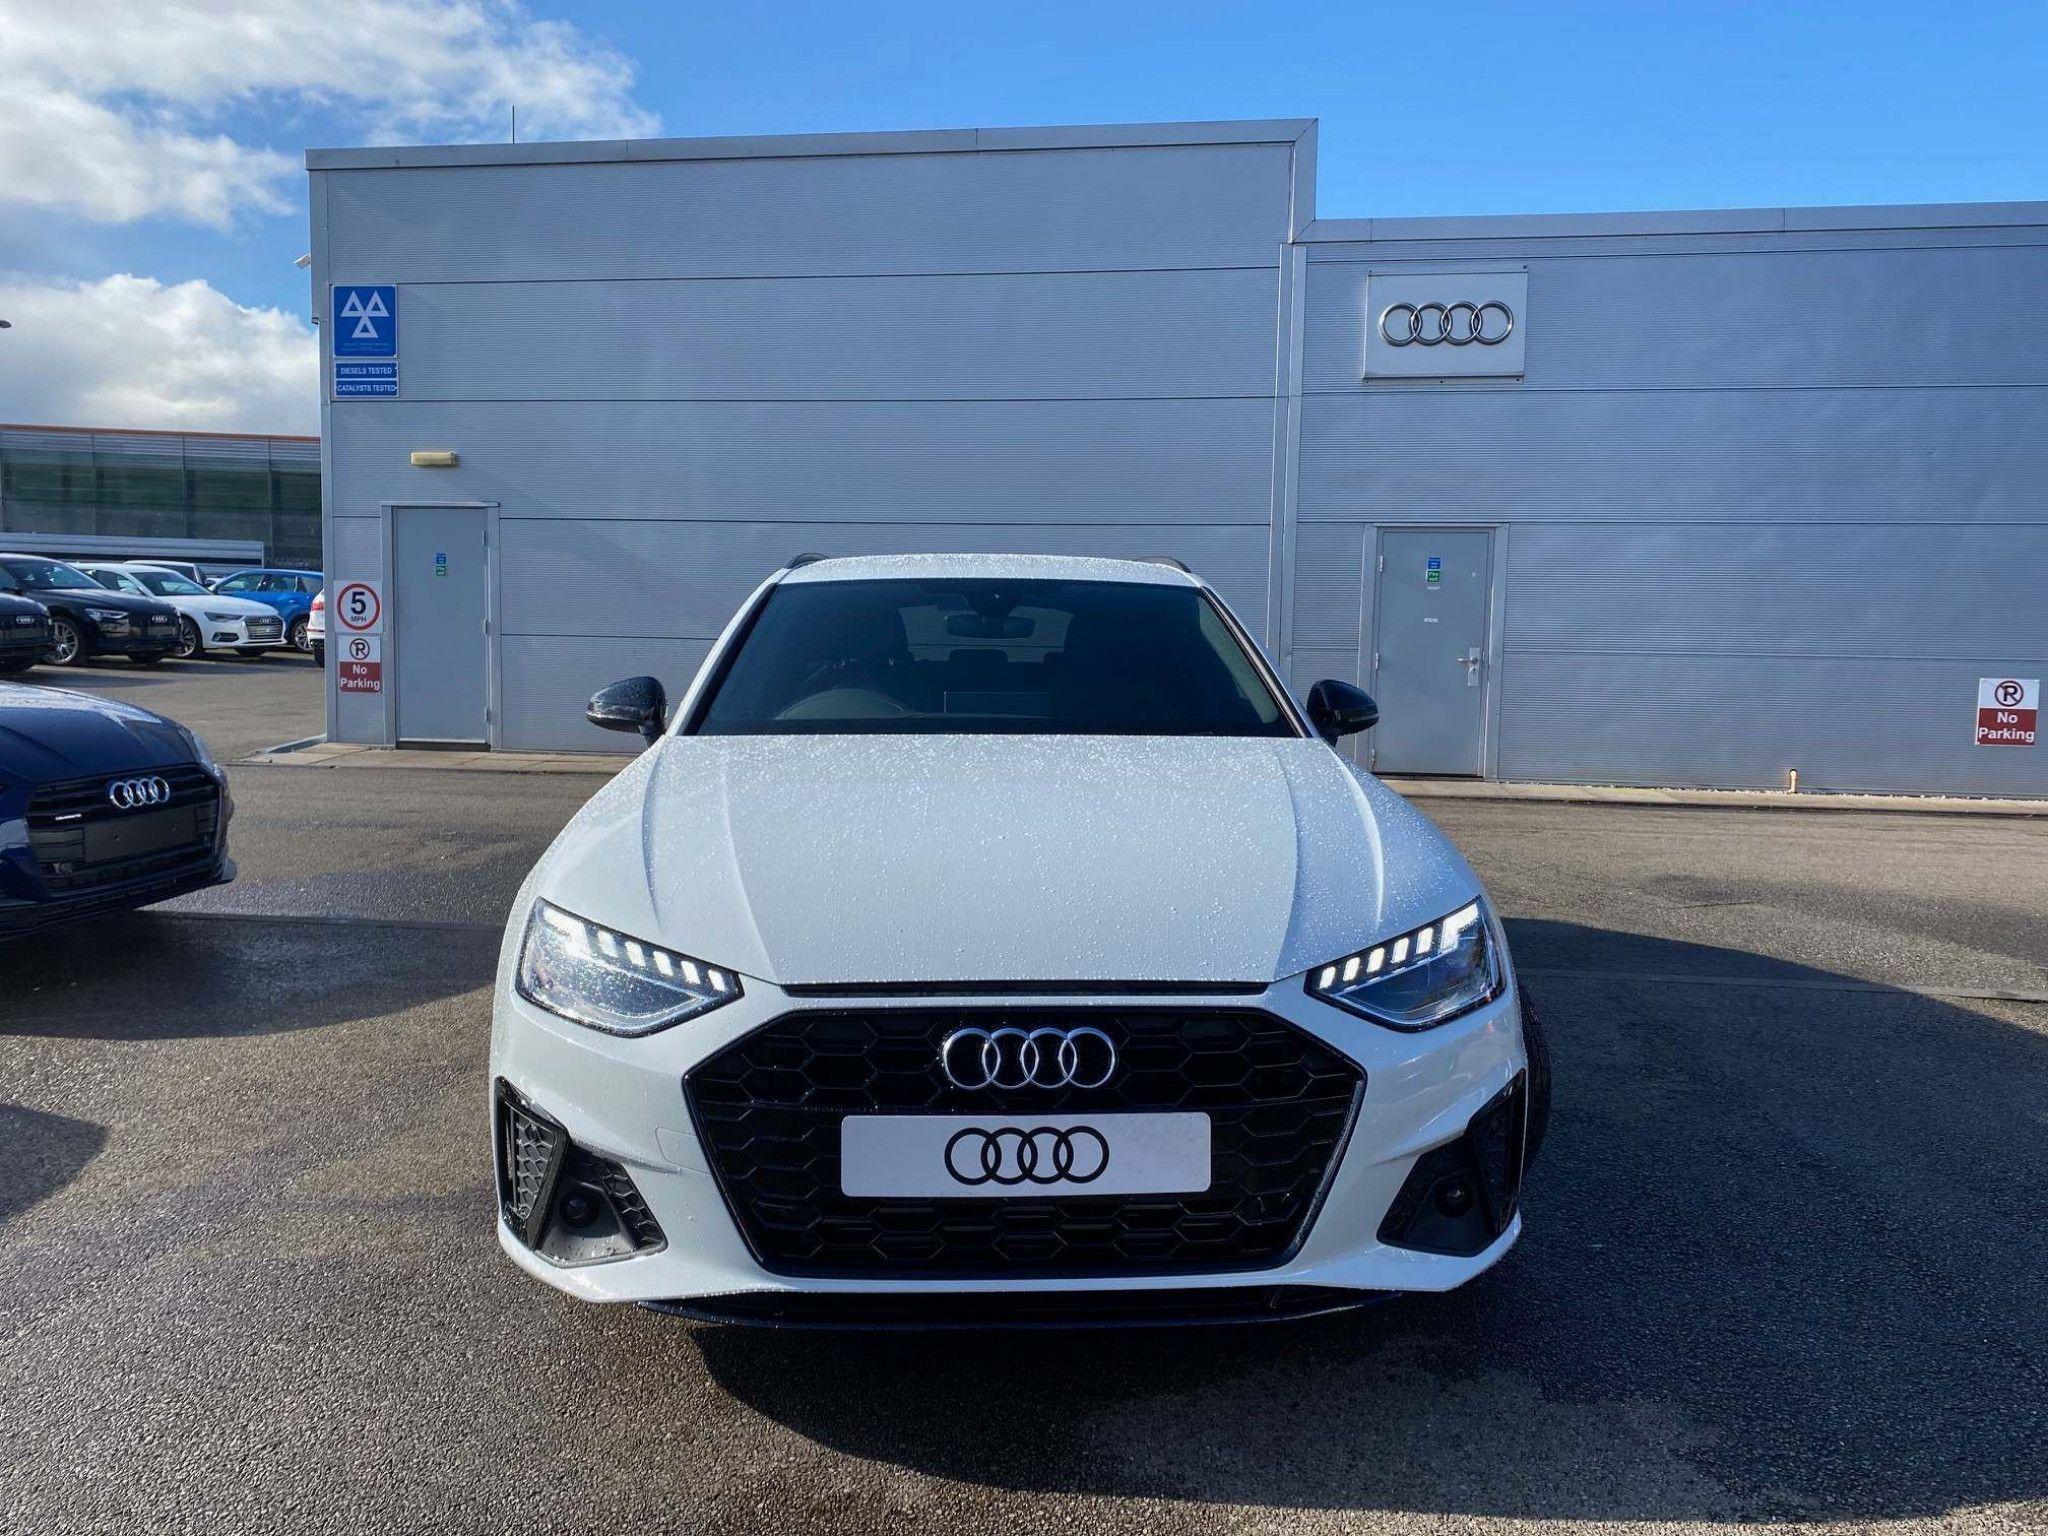 Audi A4 Avant 2 0 Tfsi 40 Black Edition Avant S Tronic S S 5dr In 2020 Audi A4 Avant Audi A4 Audi